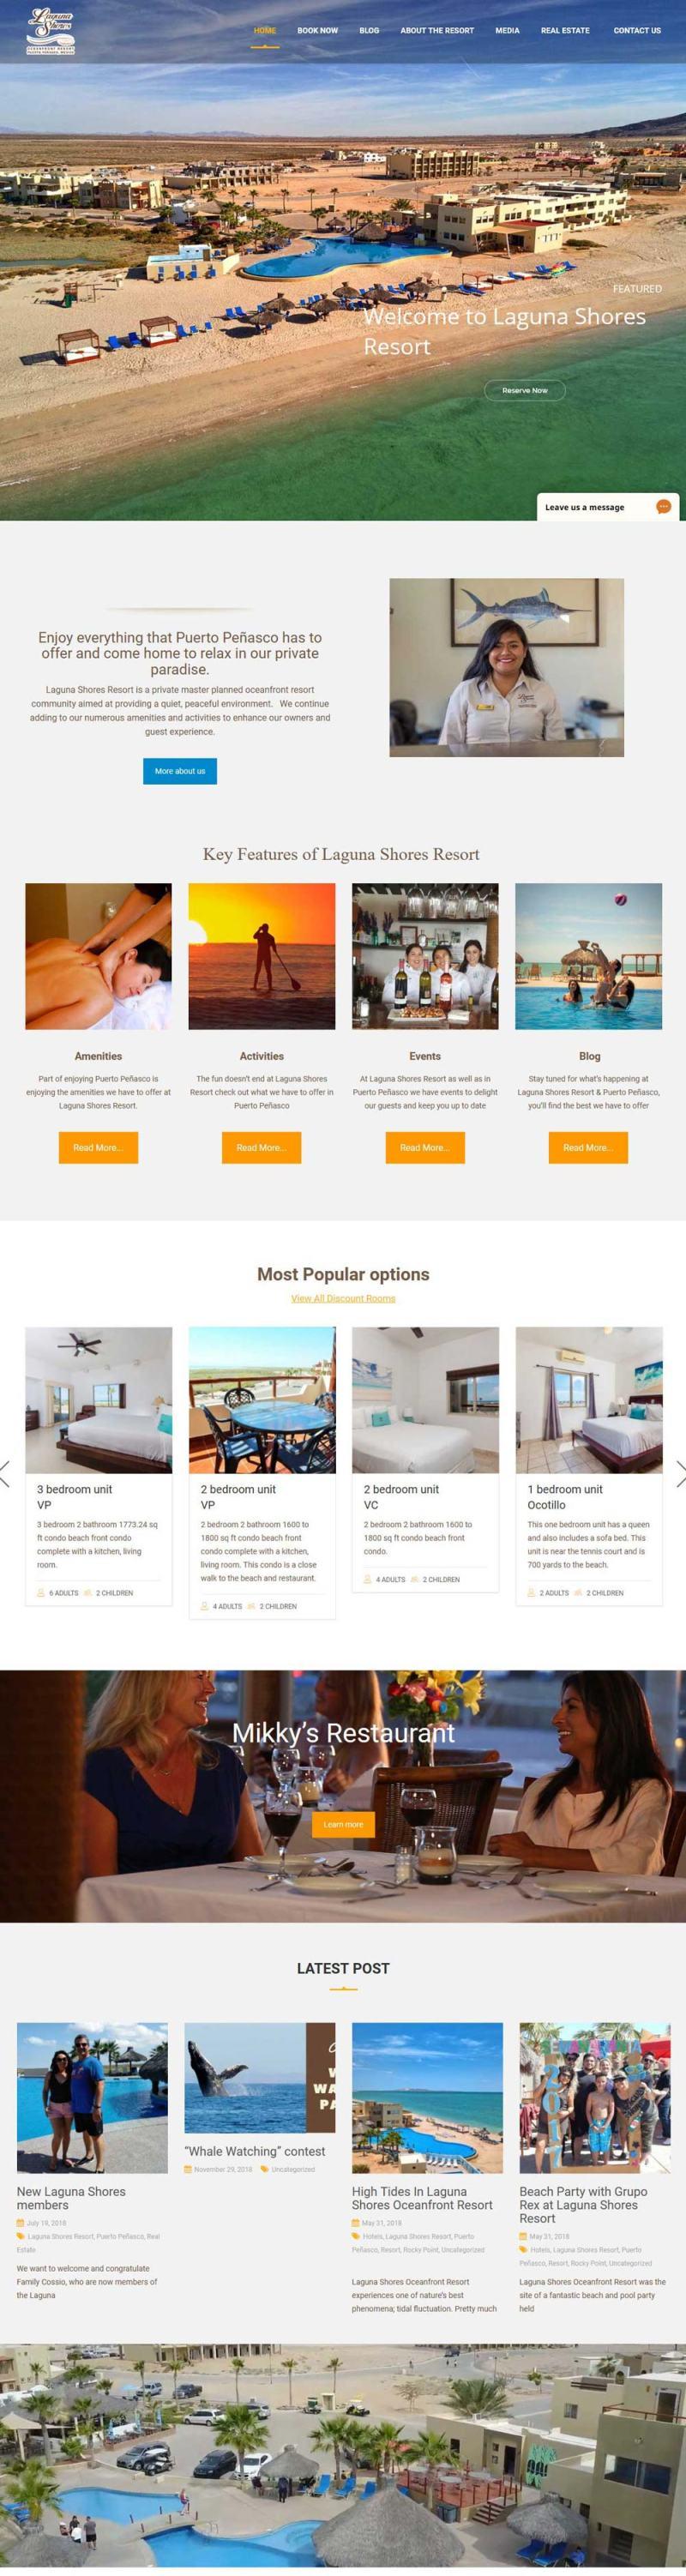 Laguna Shores Resort in Puerto Penasco (Rocky Point Mexico). Click here to visit the Laguna Shores website.